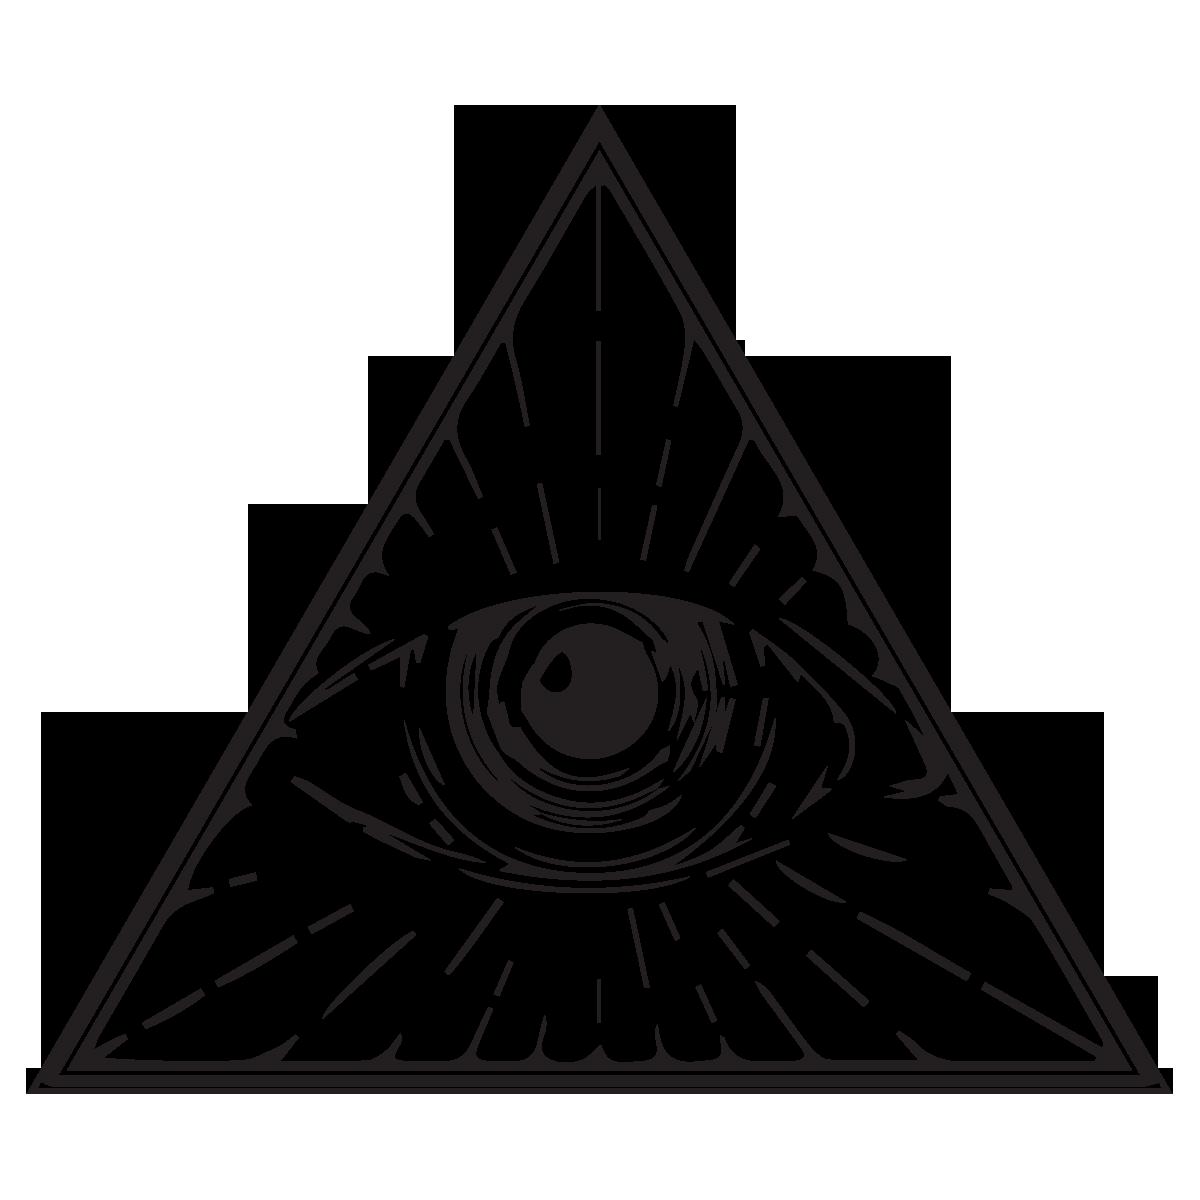 Eye of Providence Illuminati Drawing Clip art.